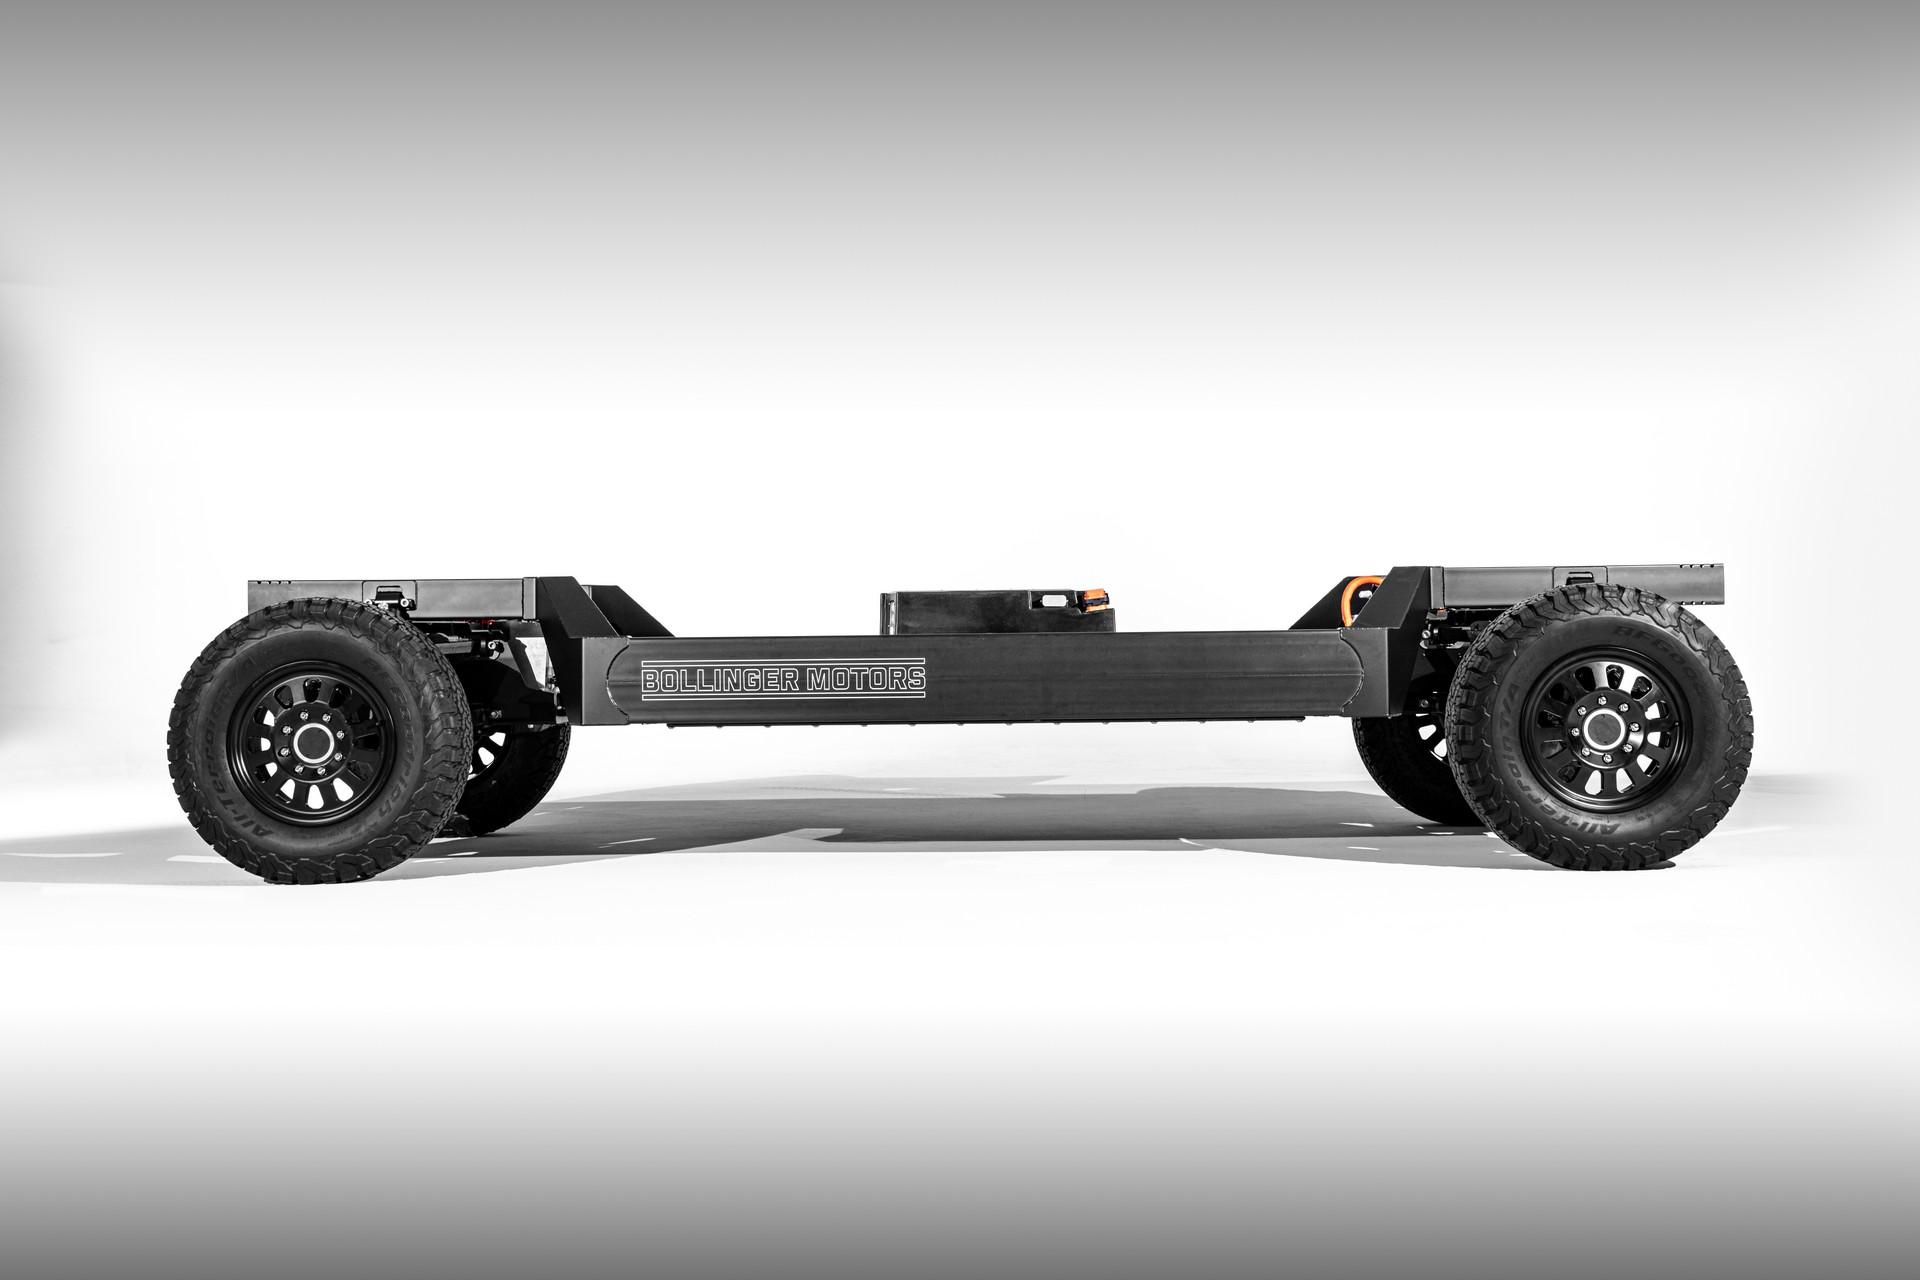 Bollinger-E-Chassis-4